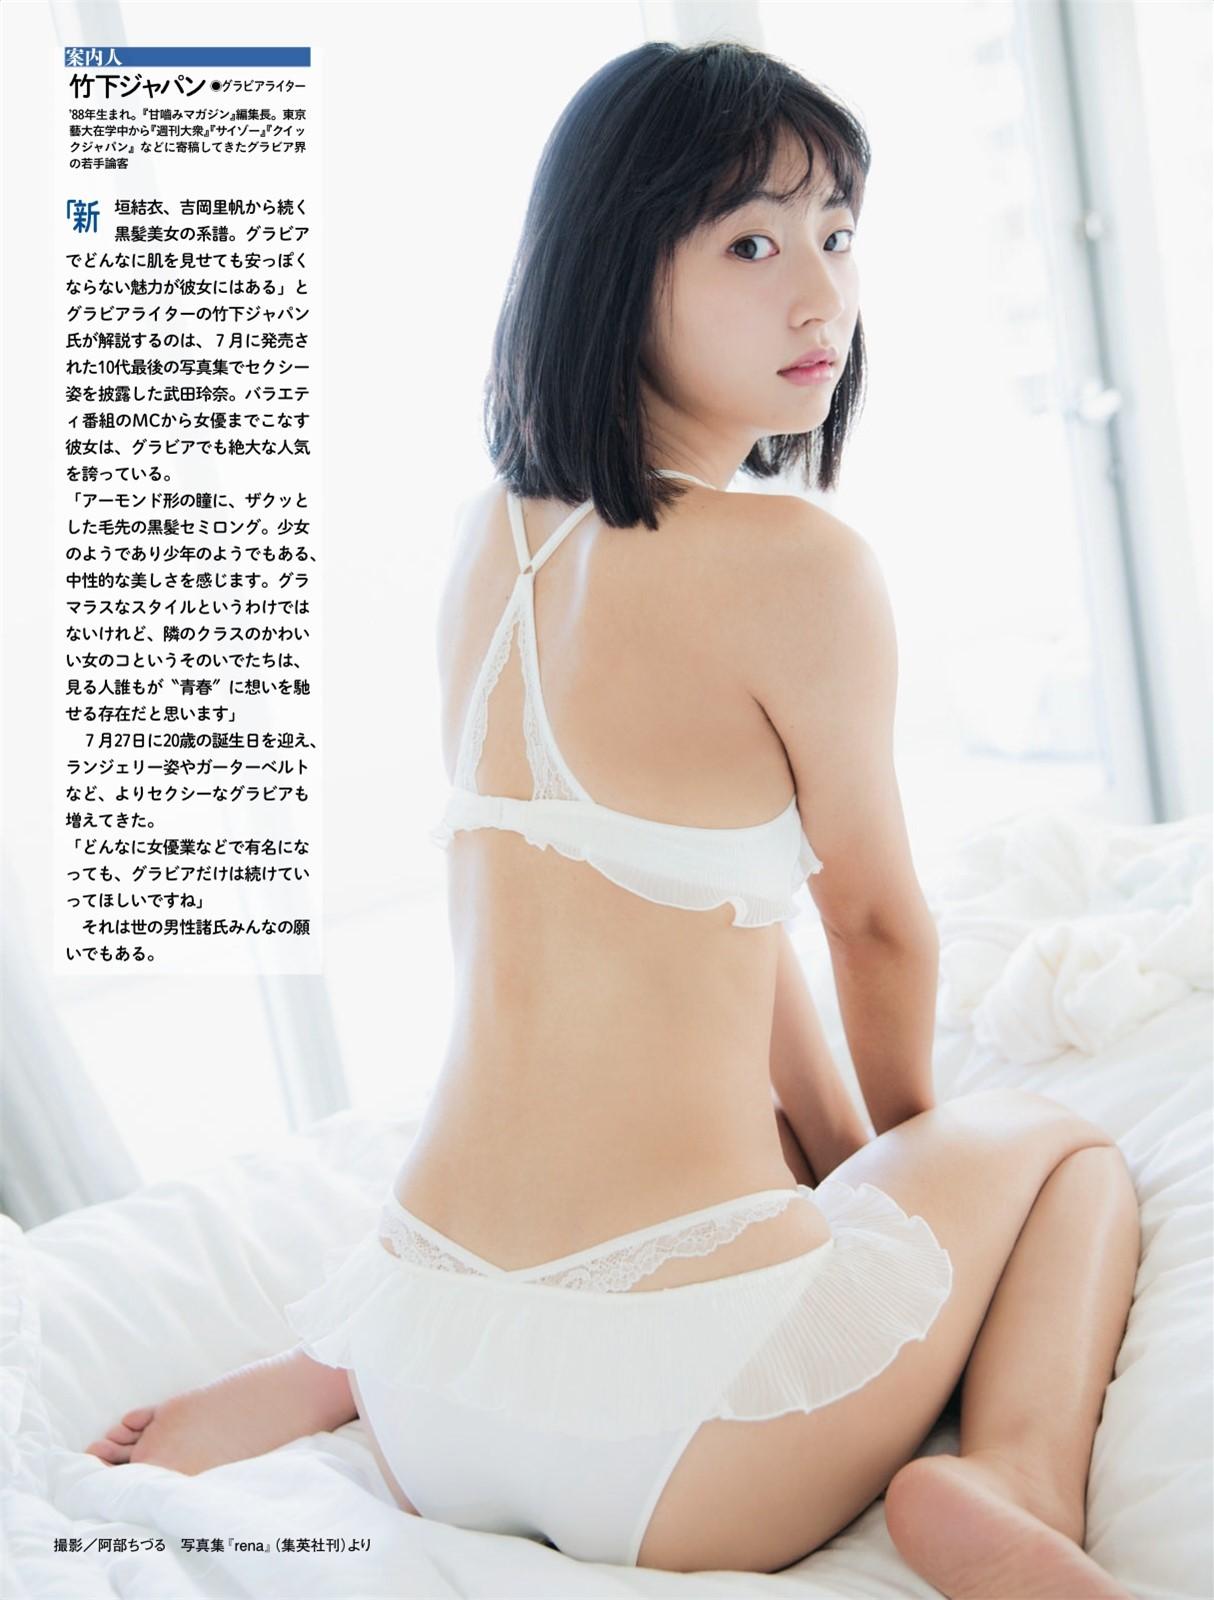 Rena Takeda 武田玲奈, Shukan SPA! 2017.08.22 (週刊スパ 2017年08月22日号)